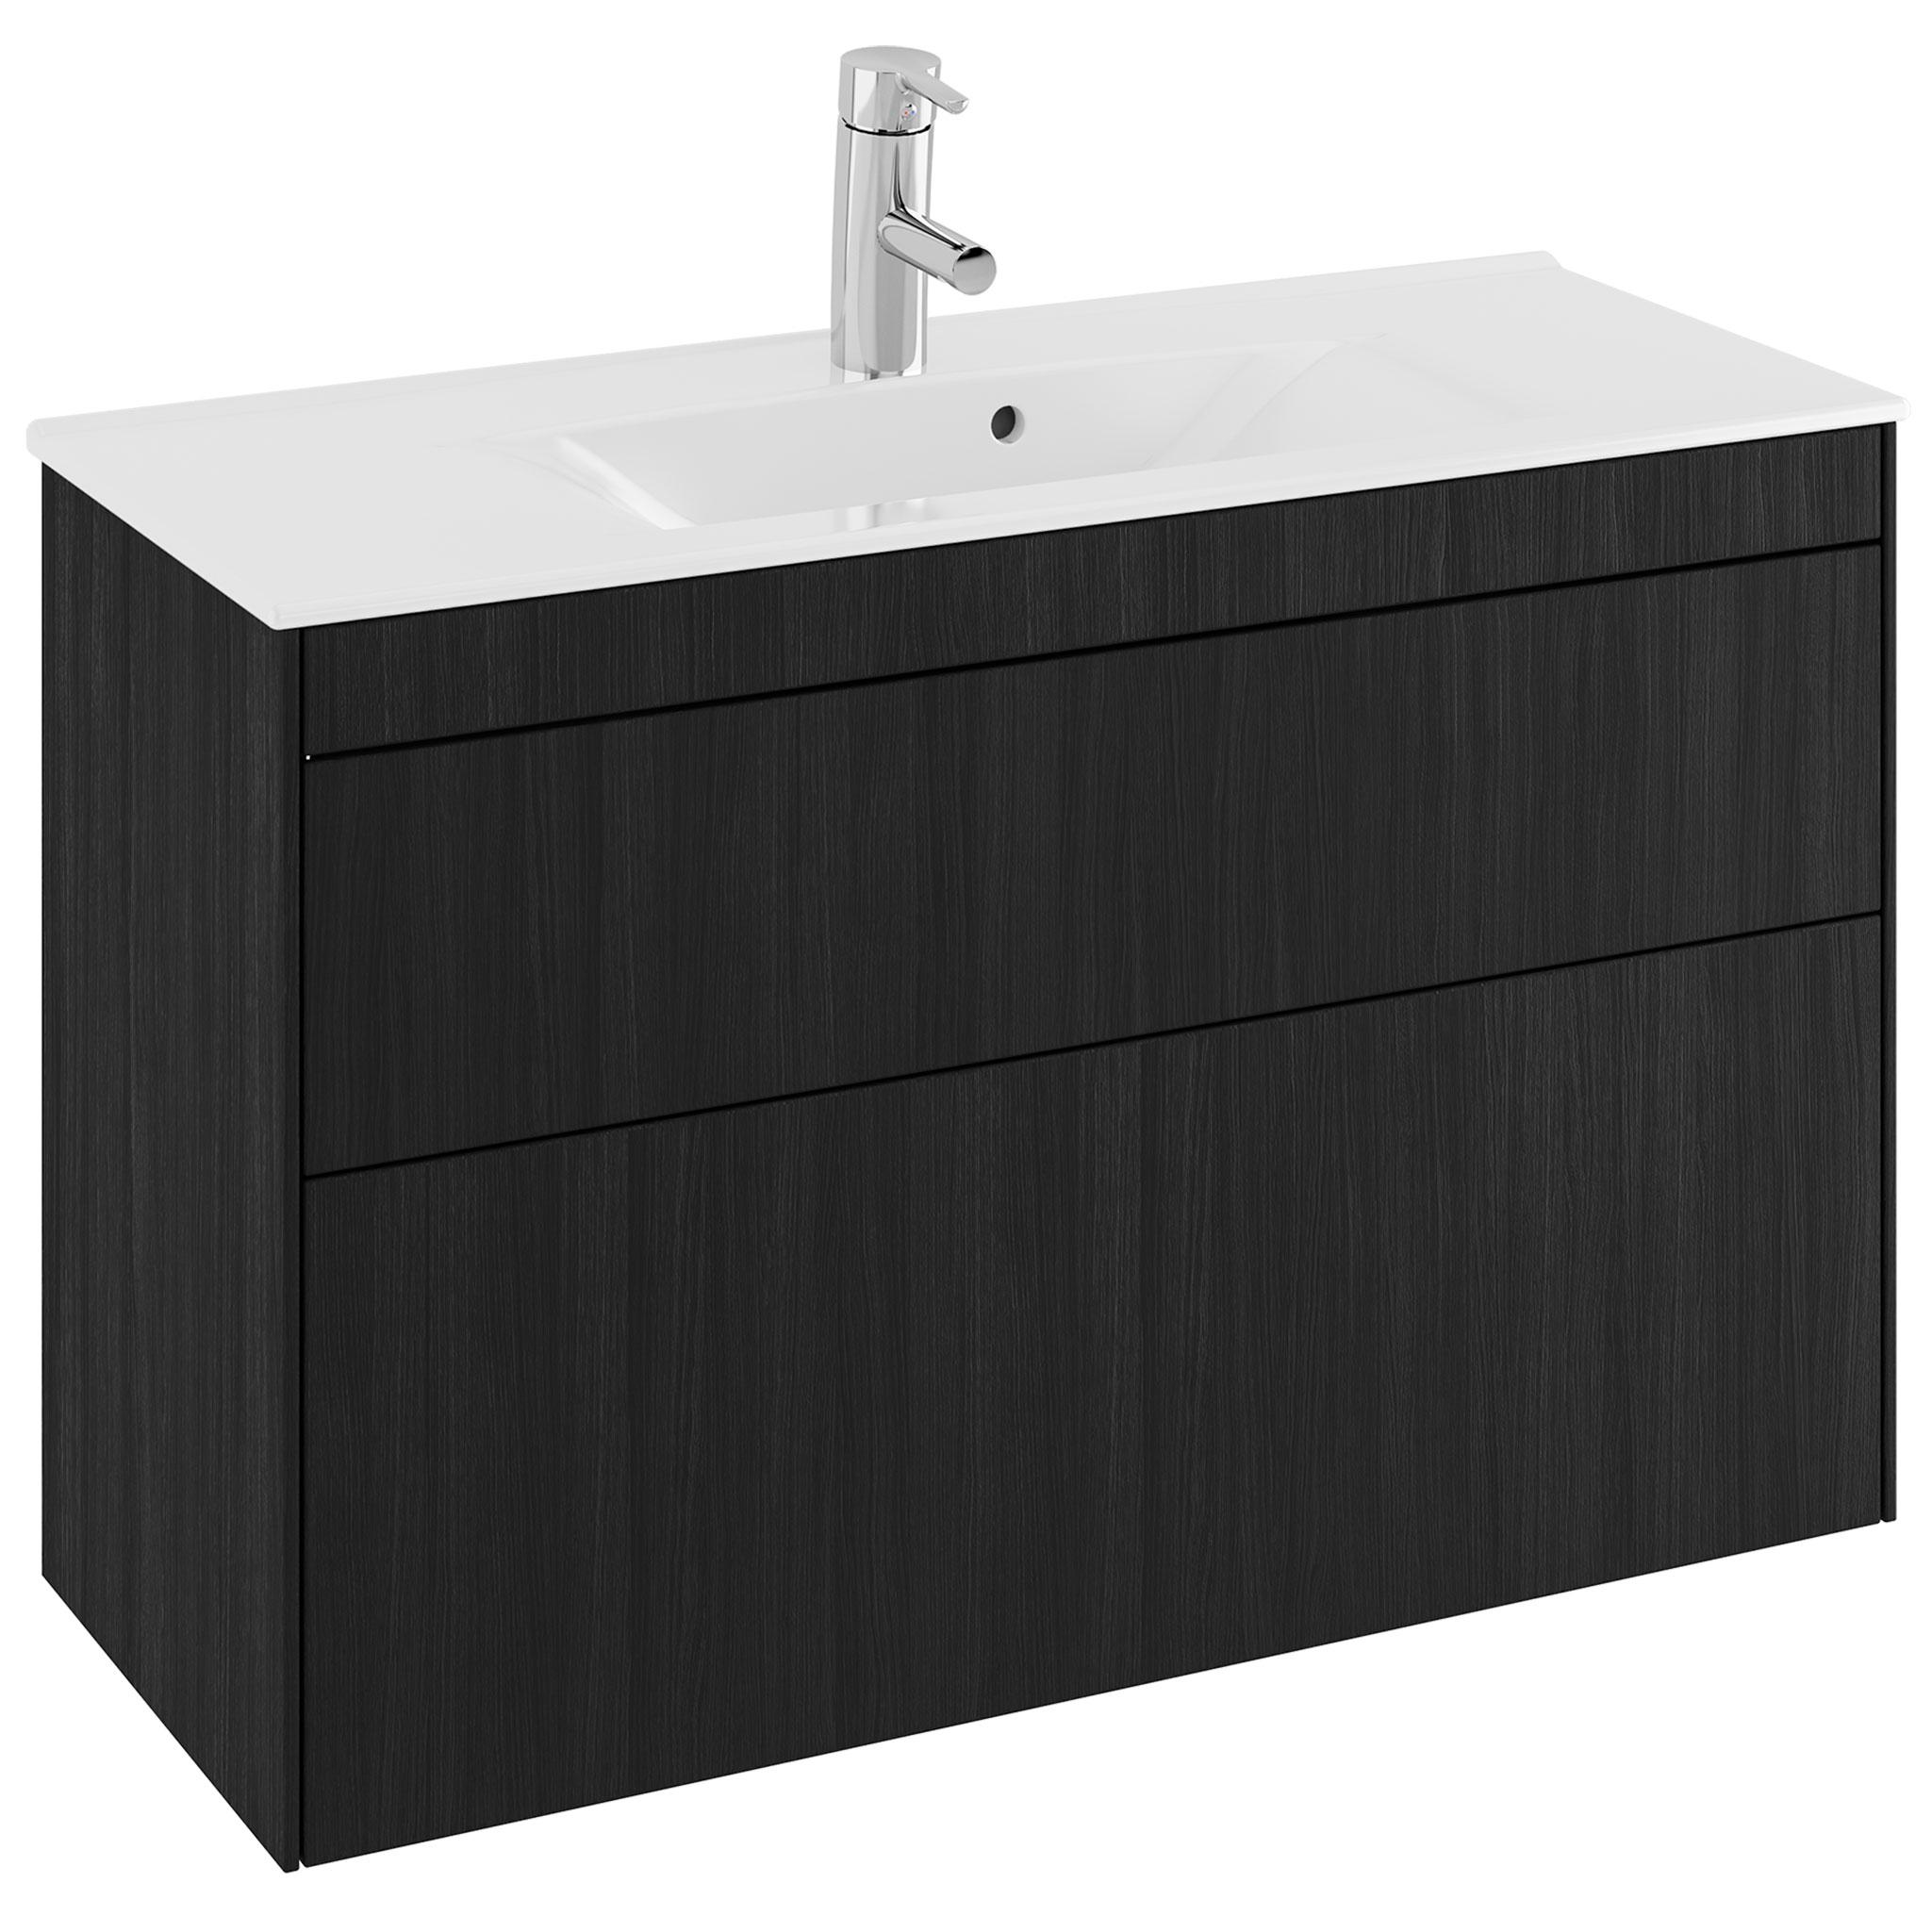 Tvättställsskåp Ifö Sense 90 Compact Lågt Tvättställ